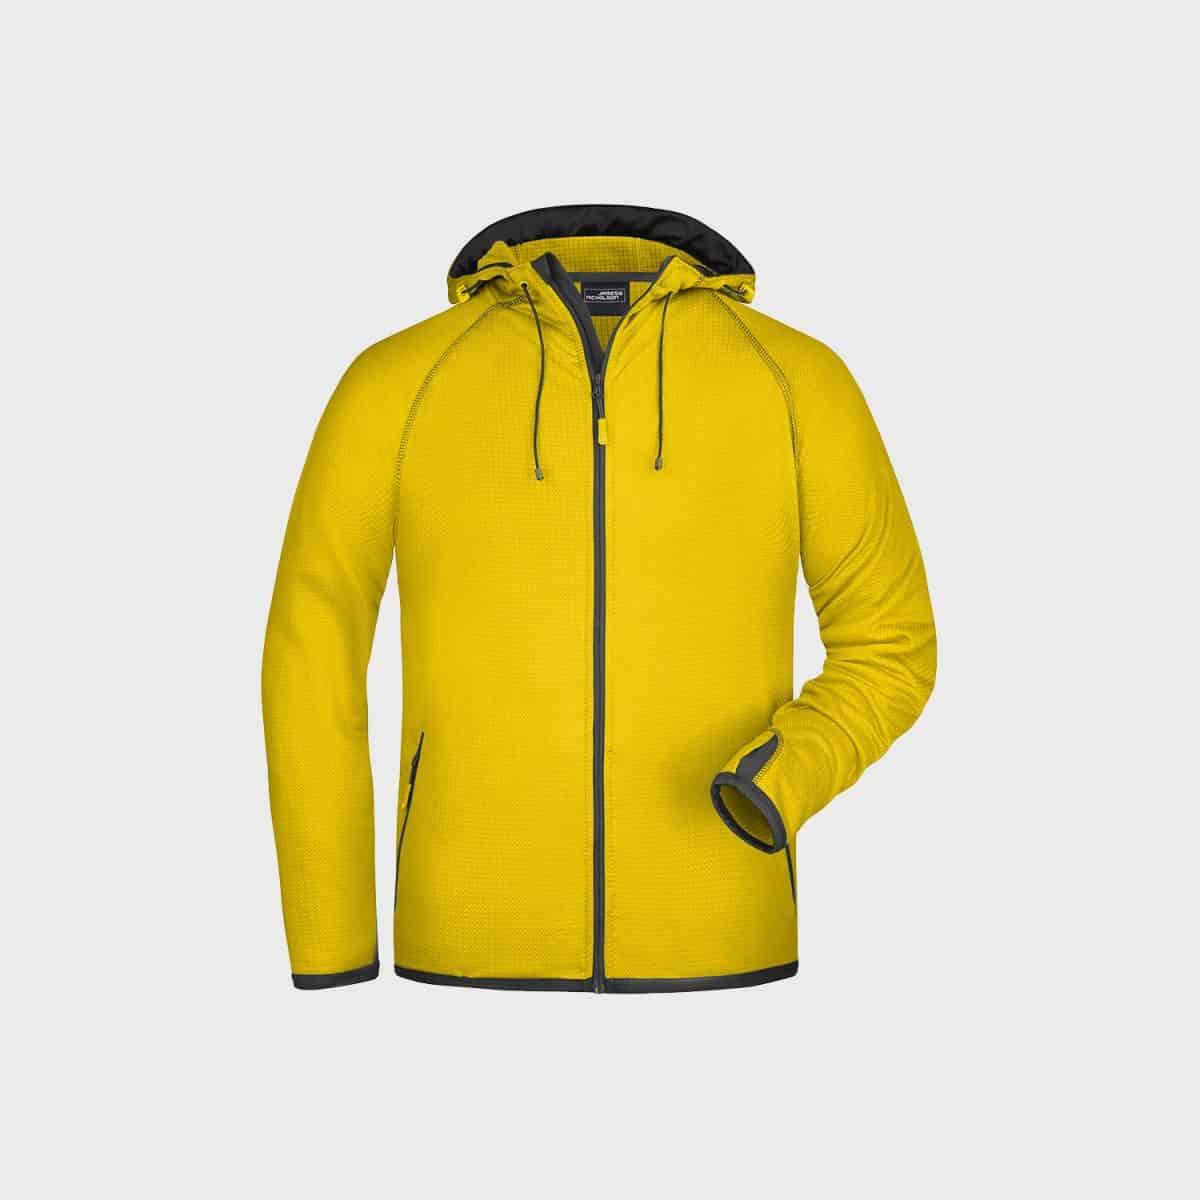 Daiber SweatJackets JN571 Yellow Carbon Side